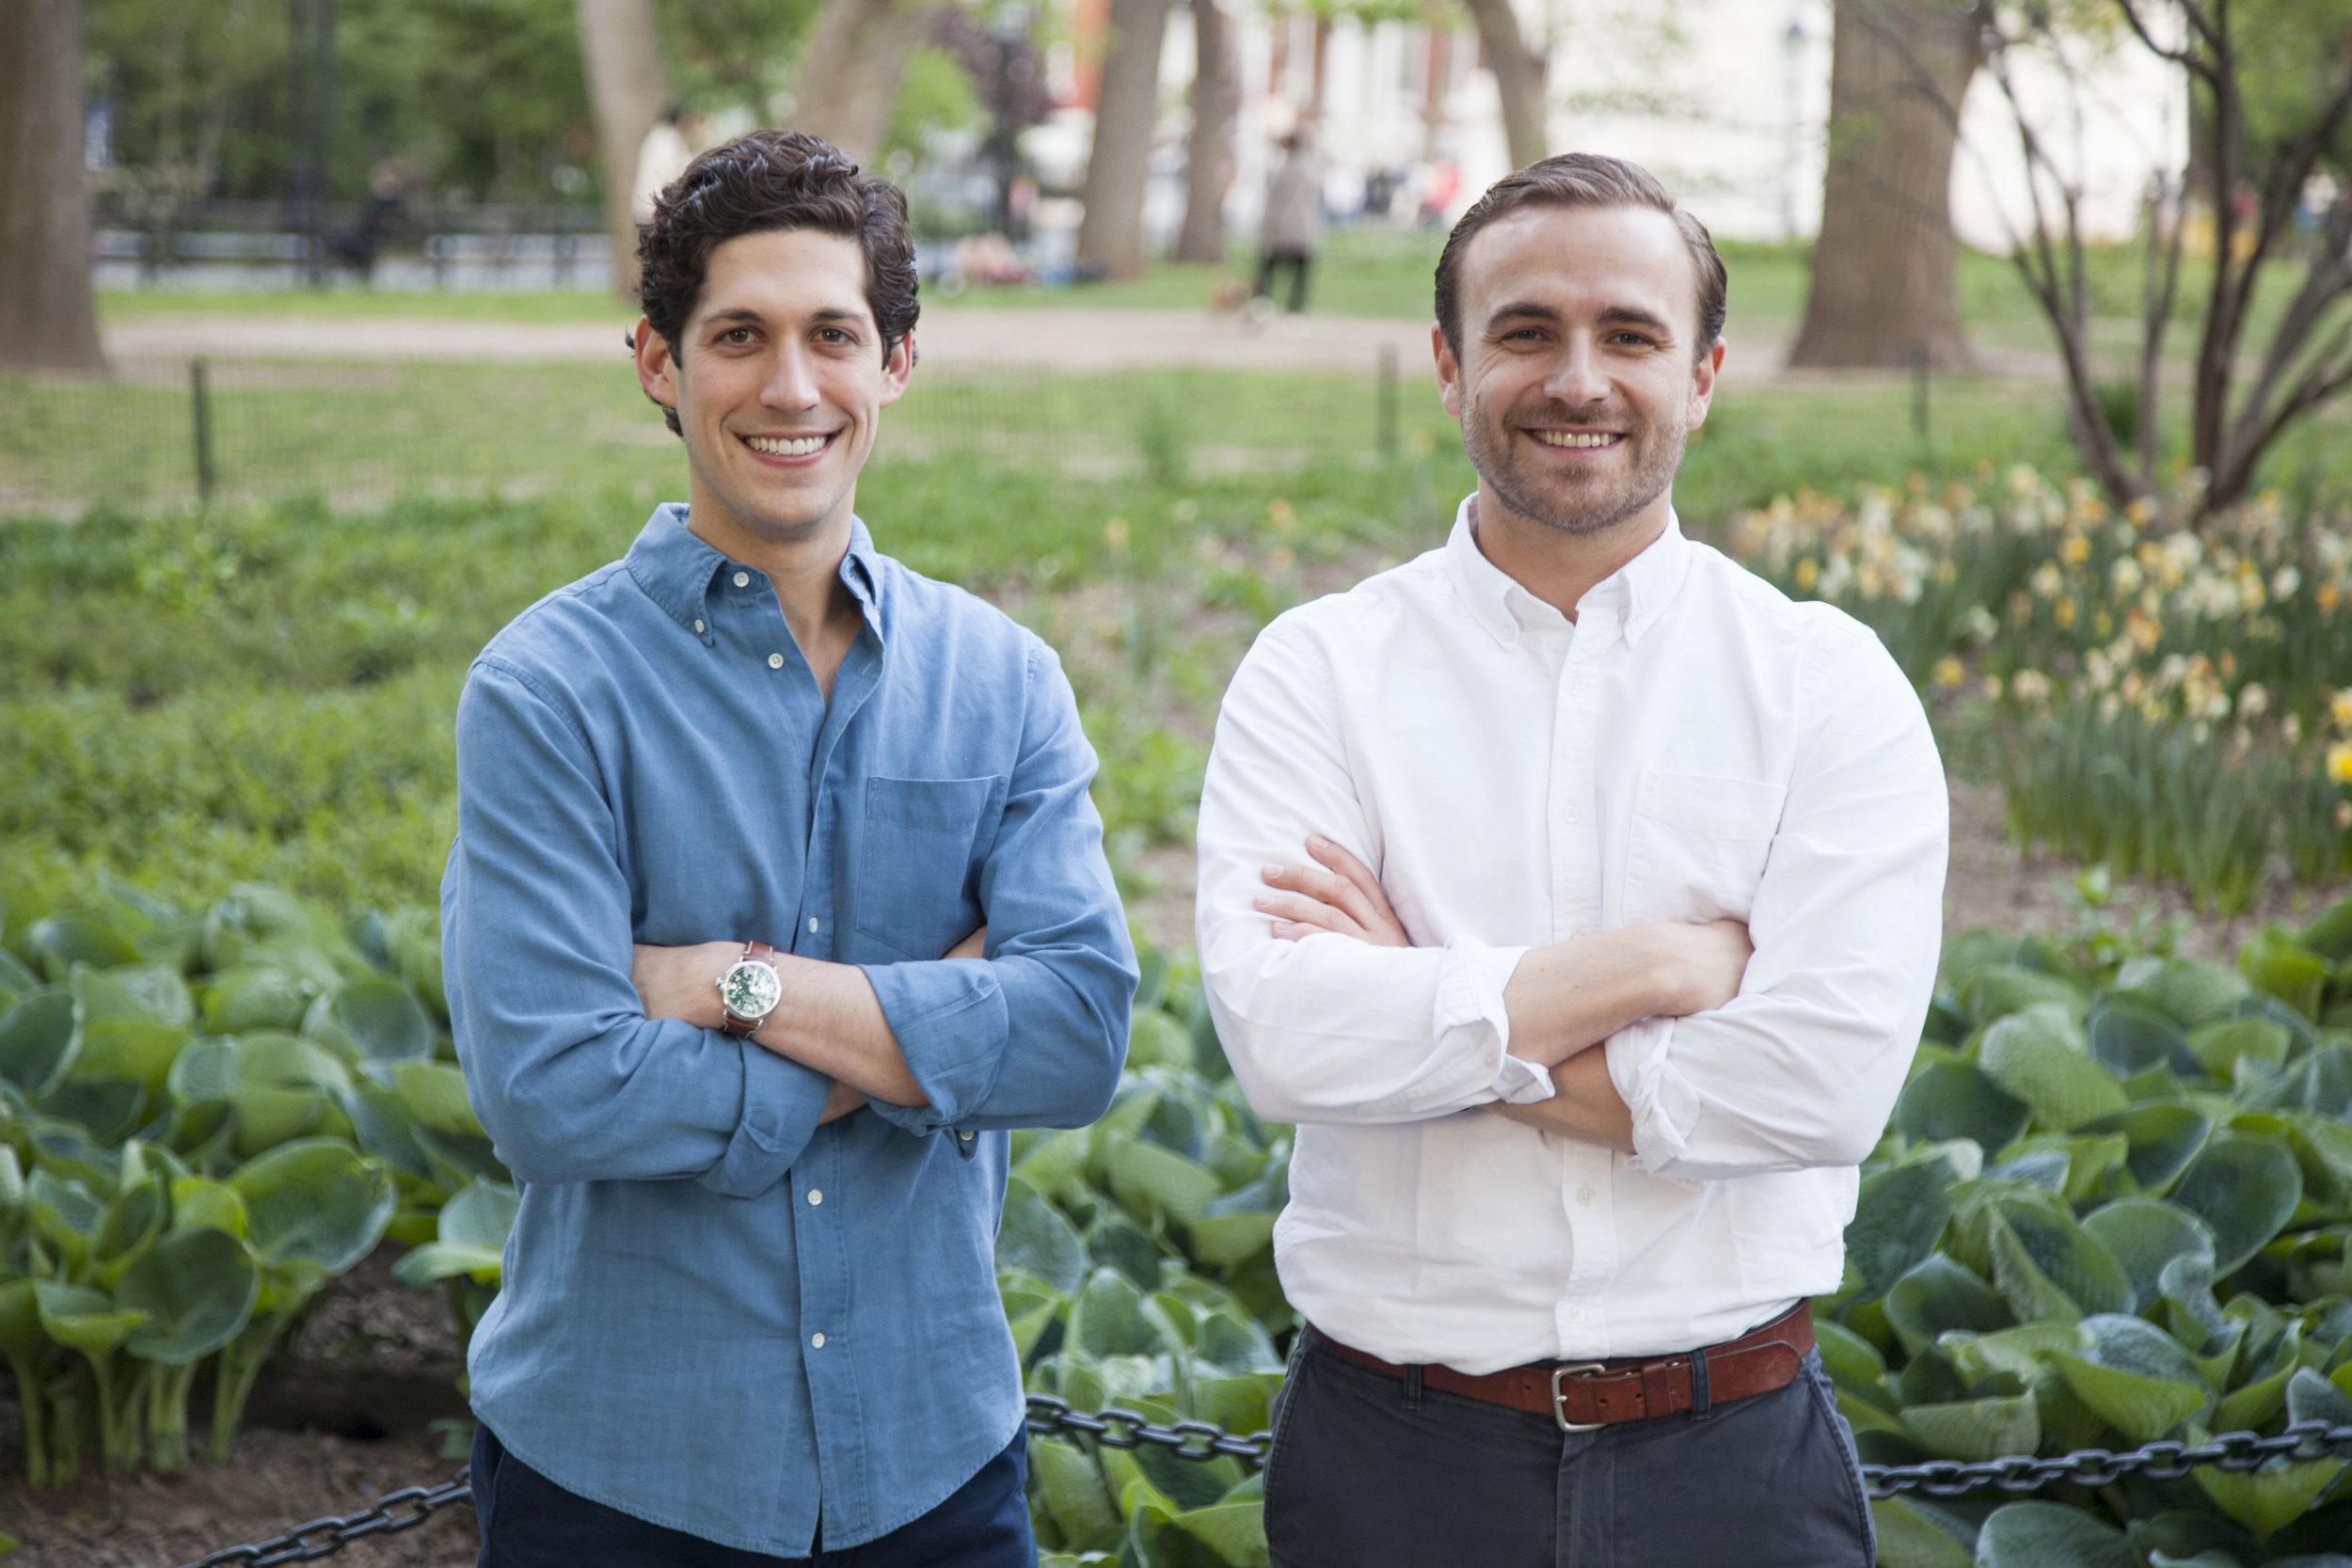 Nick Martell (L) and Jack Kramer (R), Co-Founders of MarketSnacks